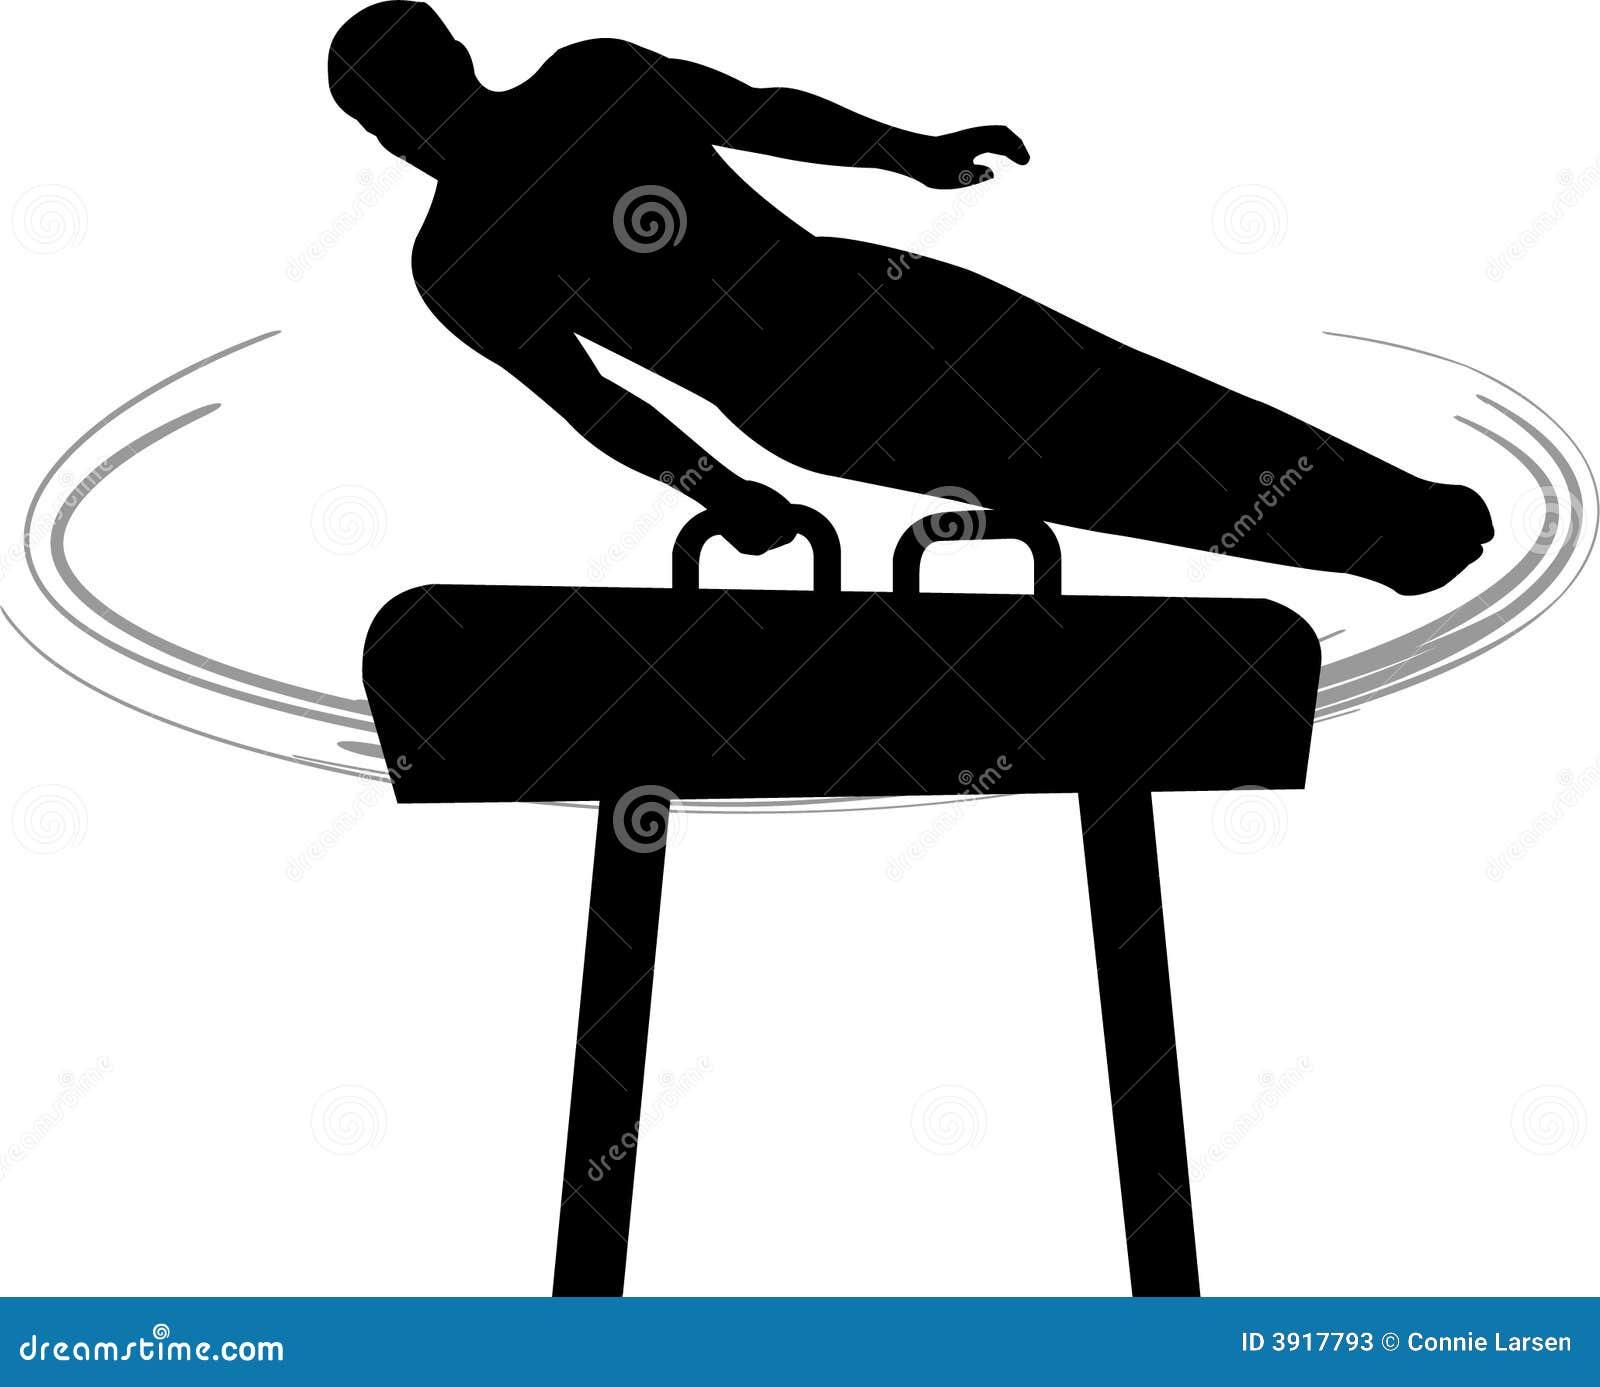 caballo de pomo de espada de la gimnasia de hombres stock